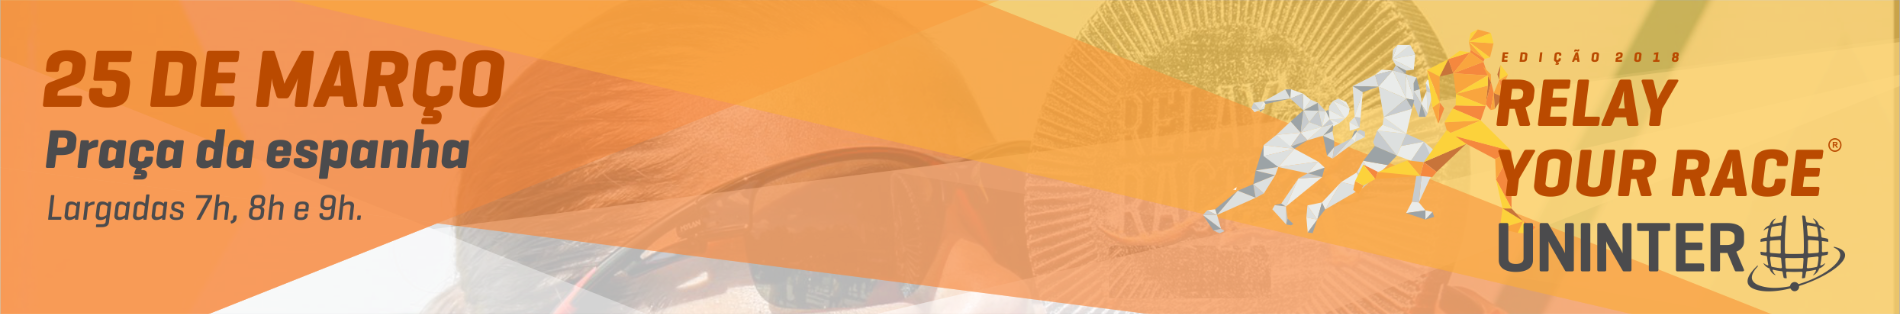 RELAY YOUR RACE - Corrida de REVEZAMENTO INDIVIDUAL - Imagem de topo